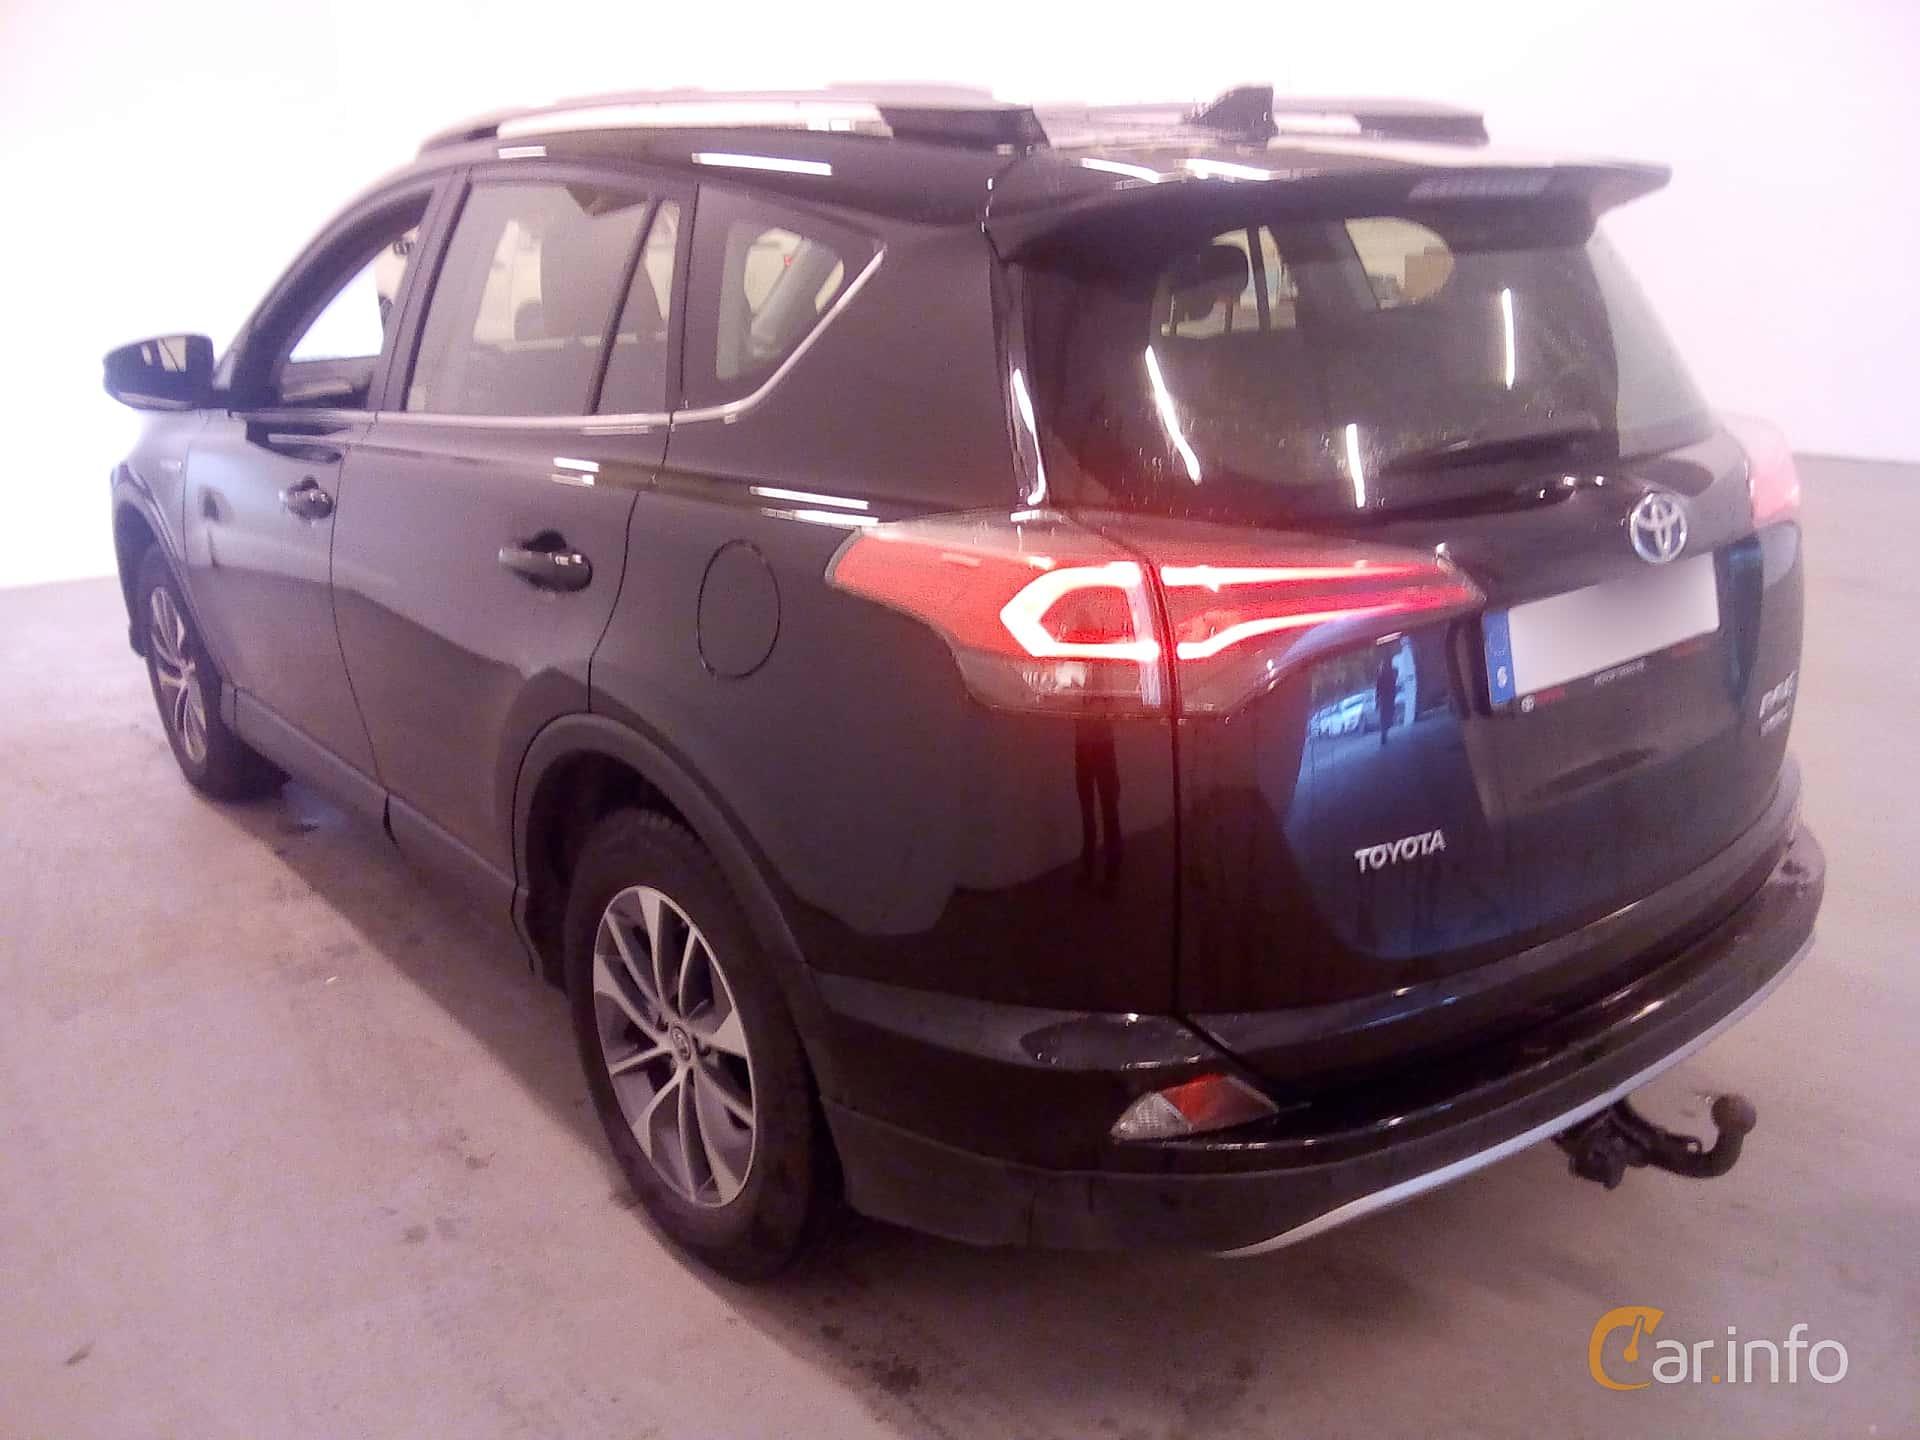 Toyota RAV4 Hybrid E-FOUR 2.5 i-AWD ECVT, 197hp, 2017